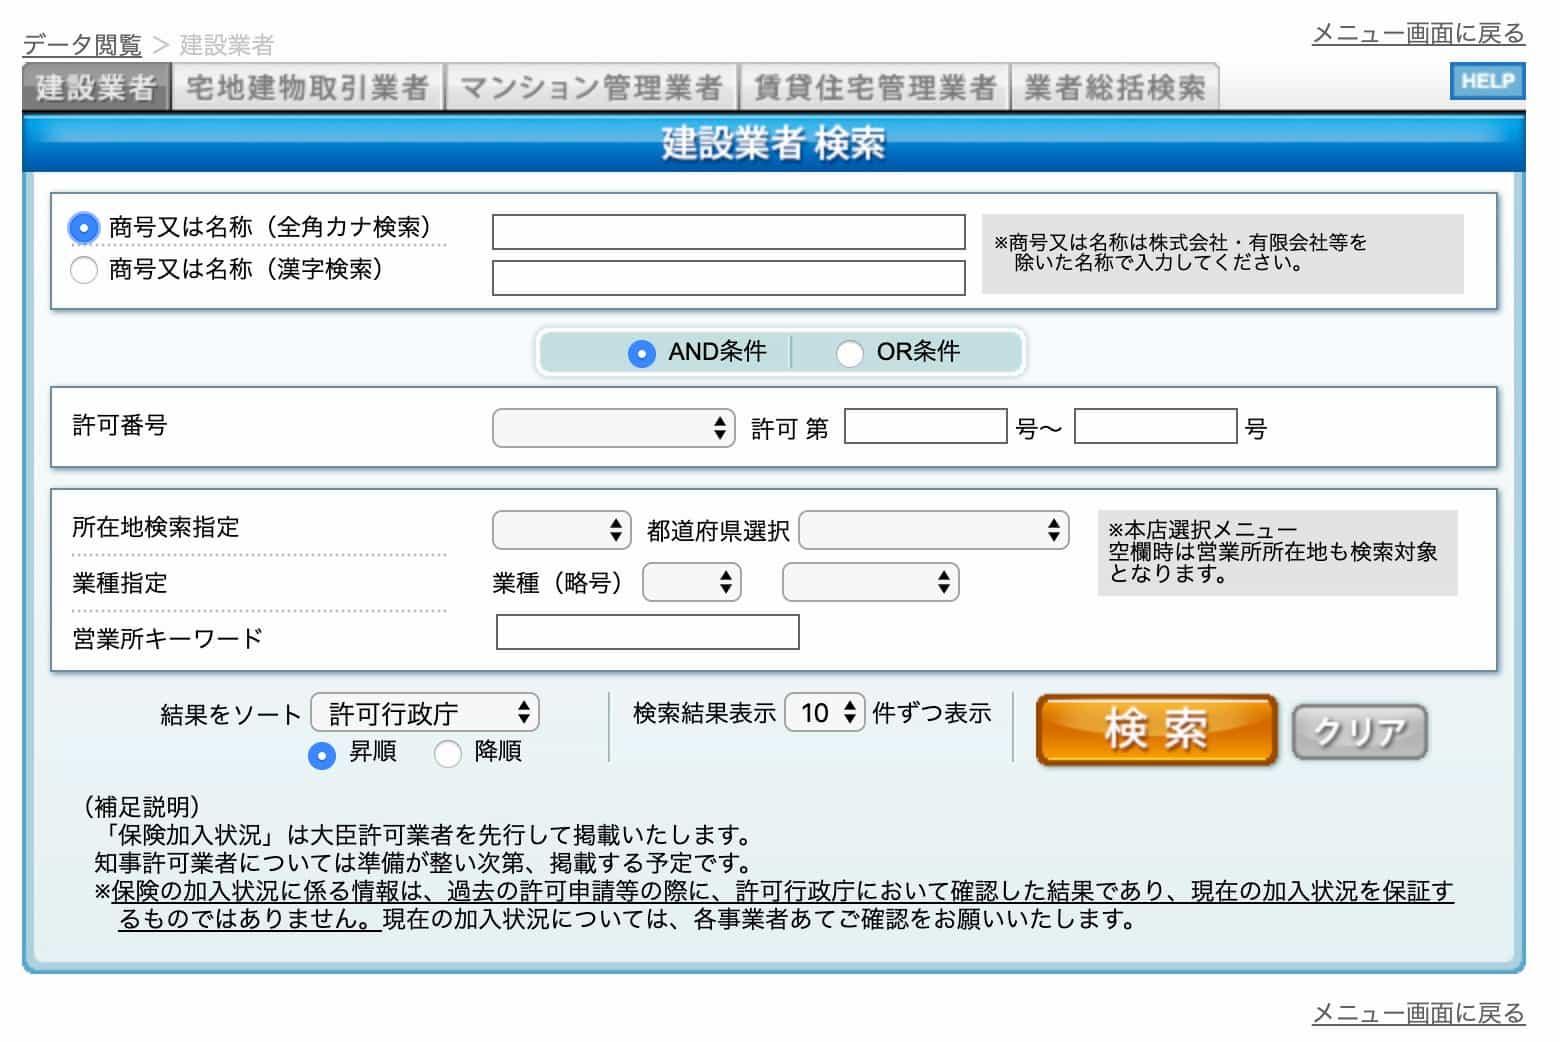 建設業者・宅建業者等企業情報検索システムの検索窓